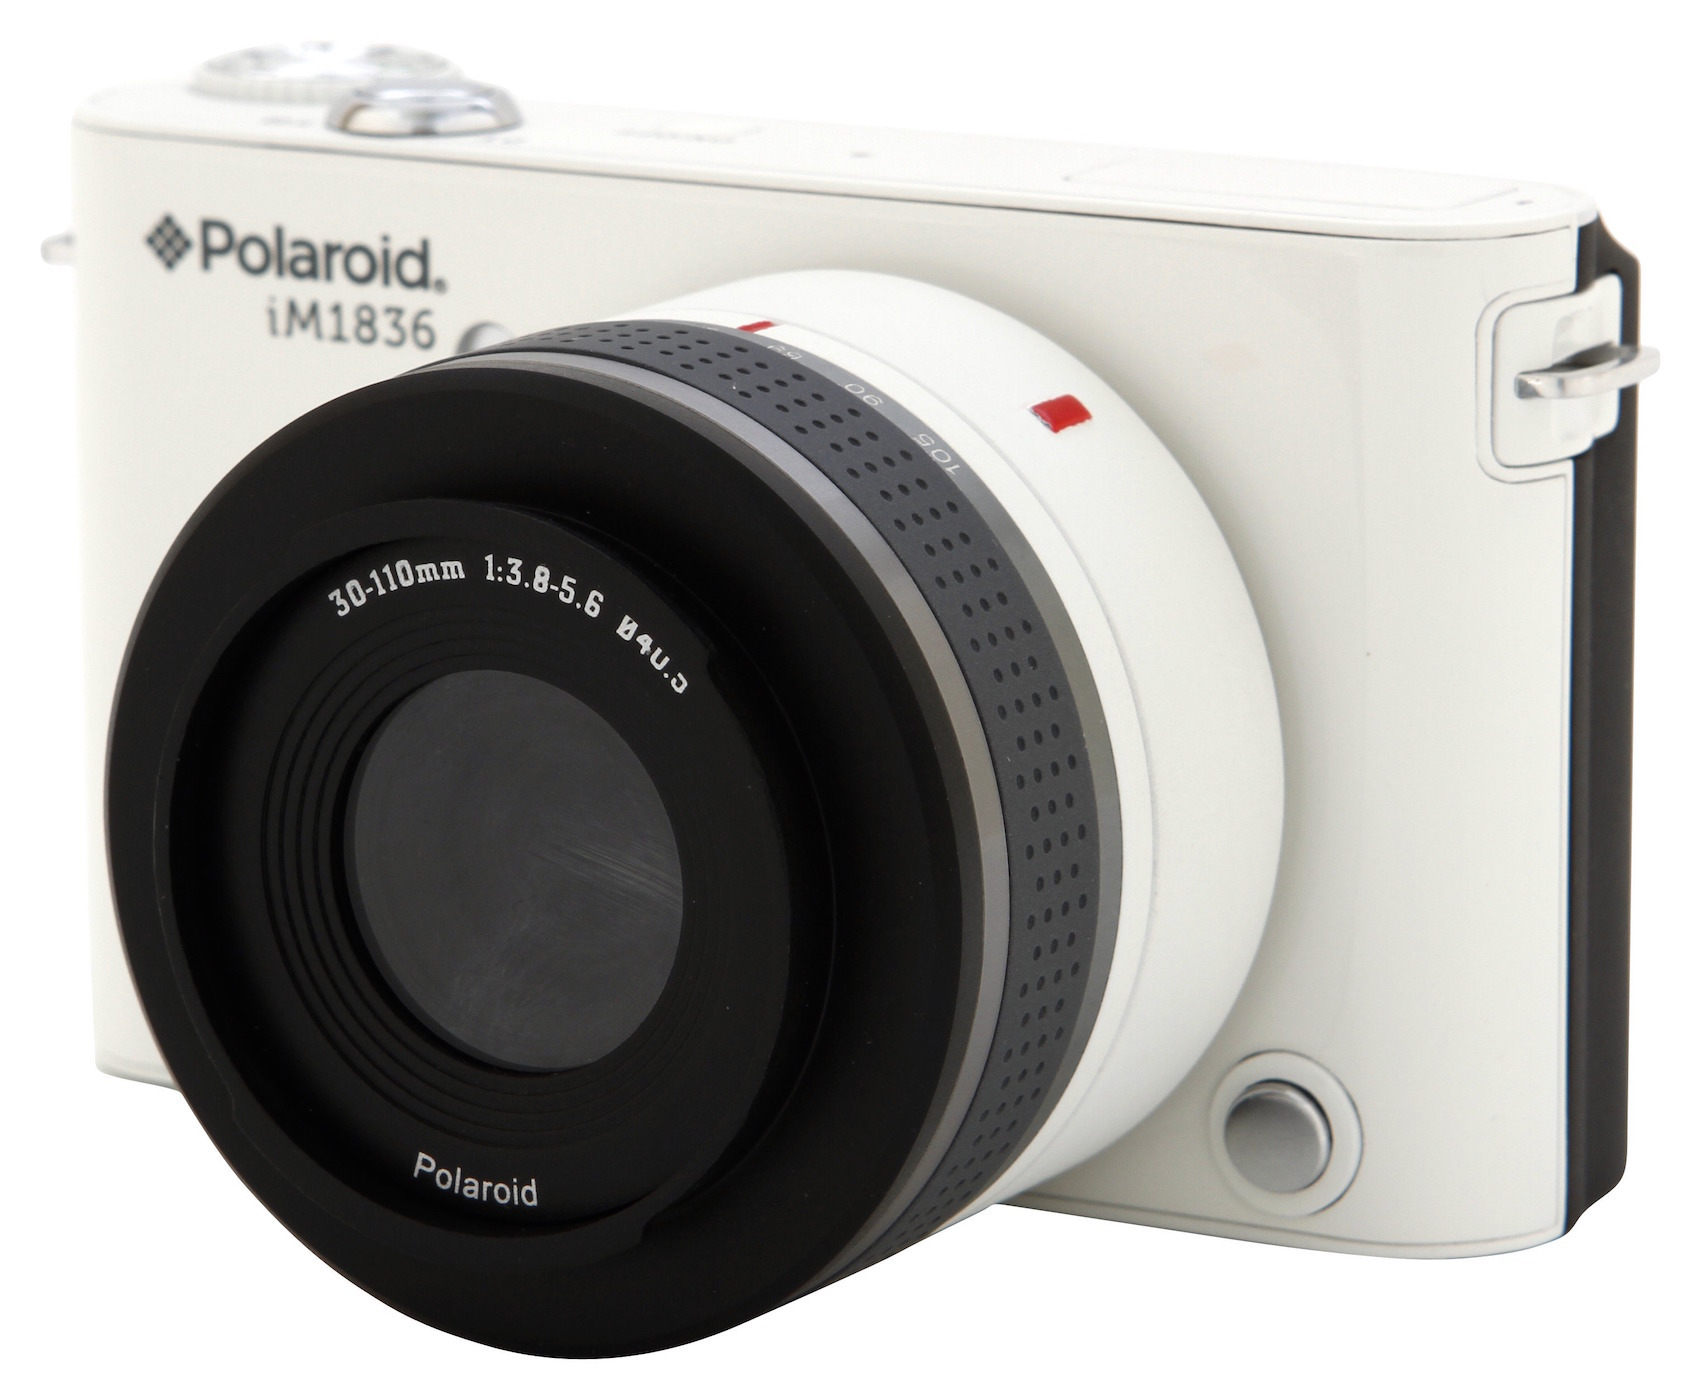 Polaroid фотоаппараты в 2016 году - 7